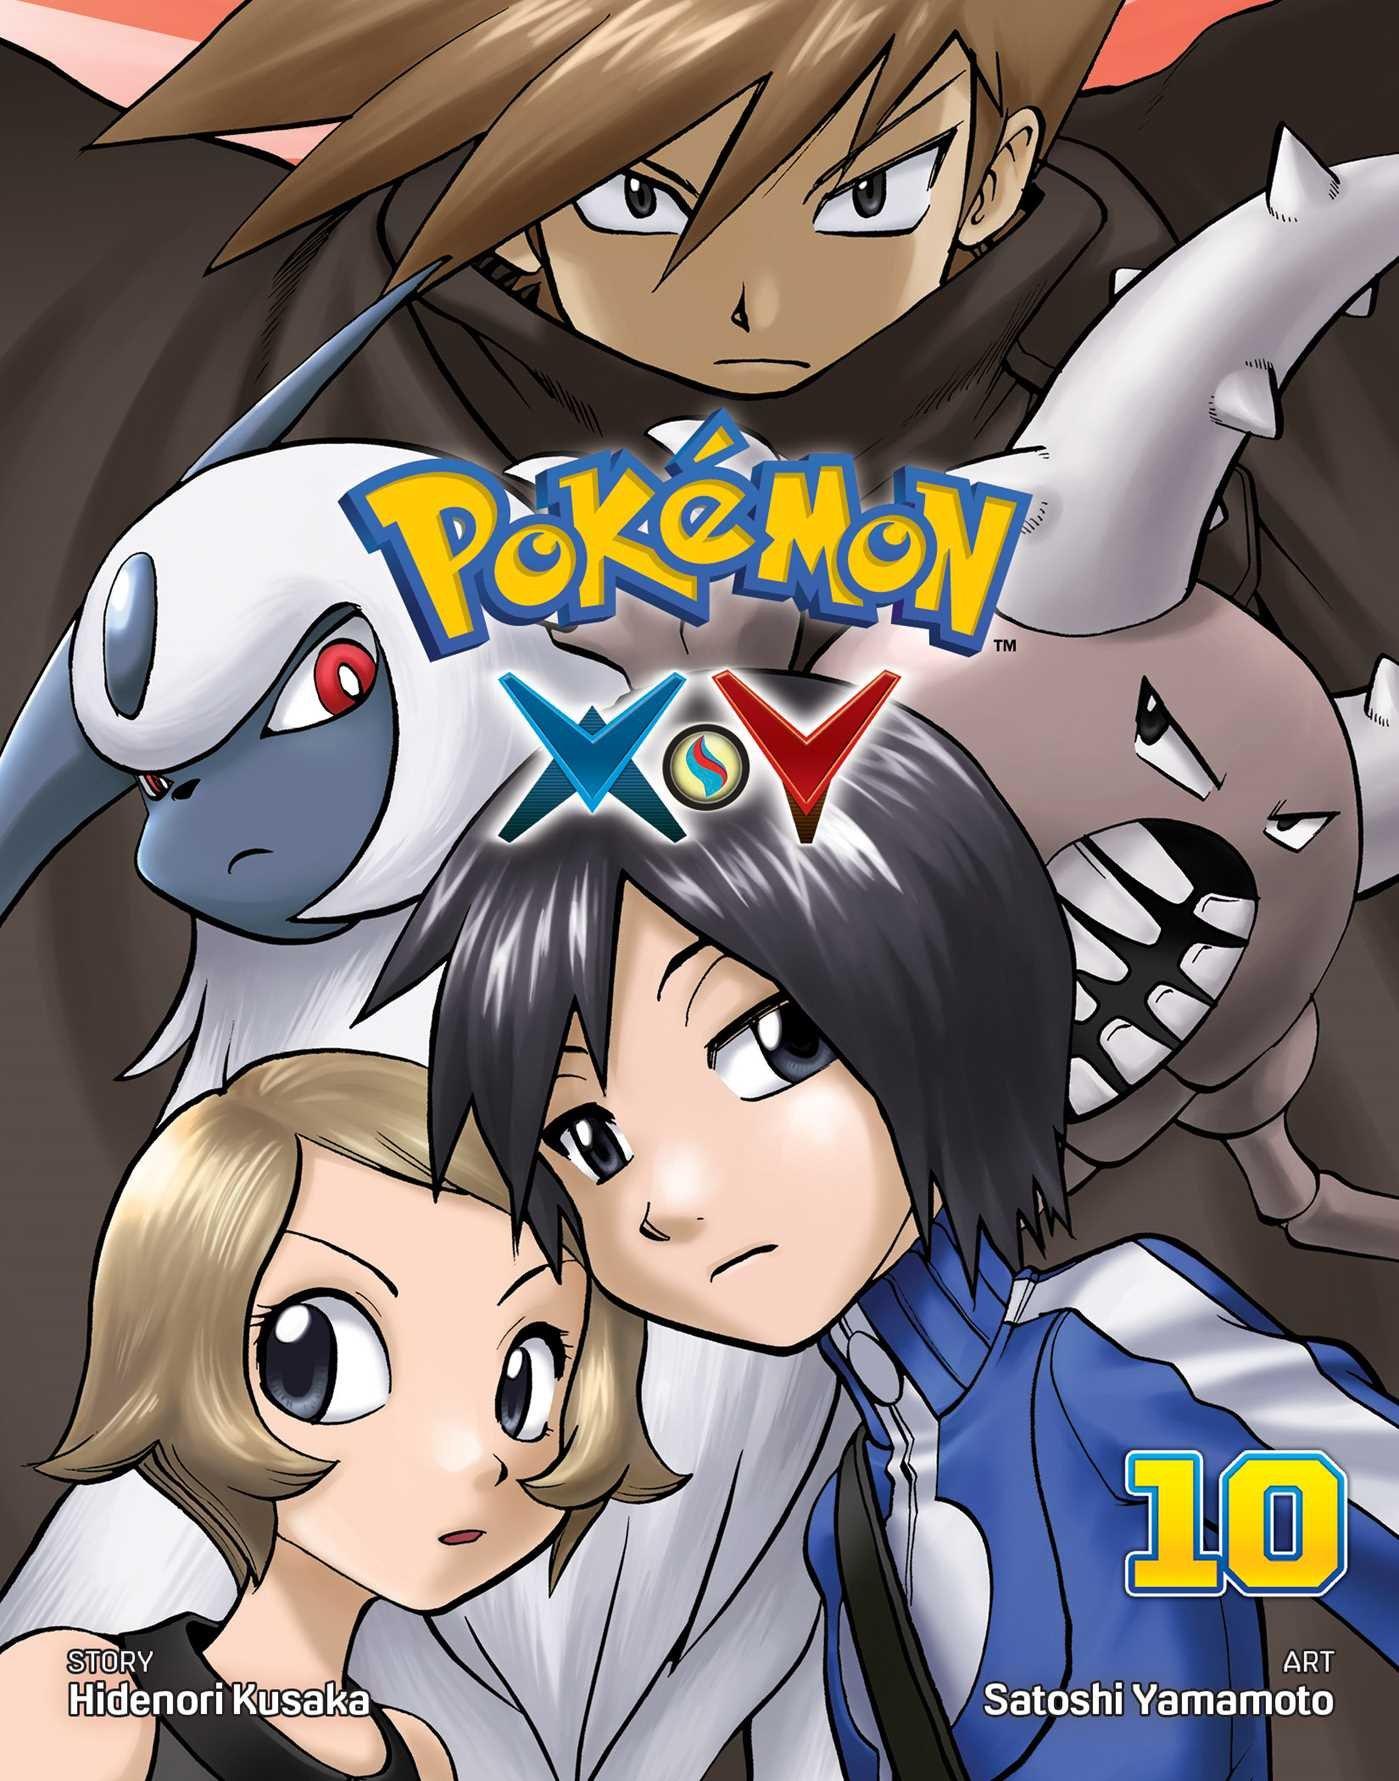 Pokémon X•Y, Vol. 10 (Pokemon)